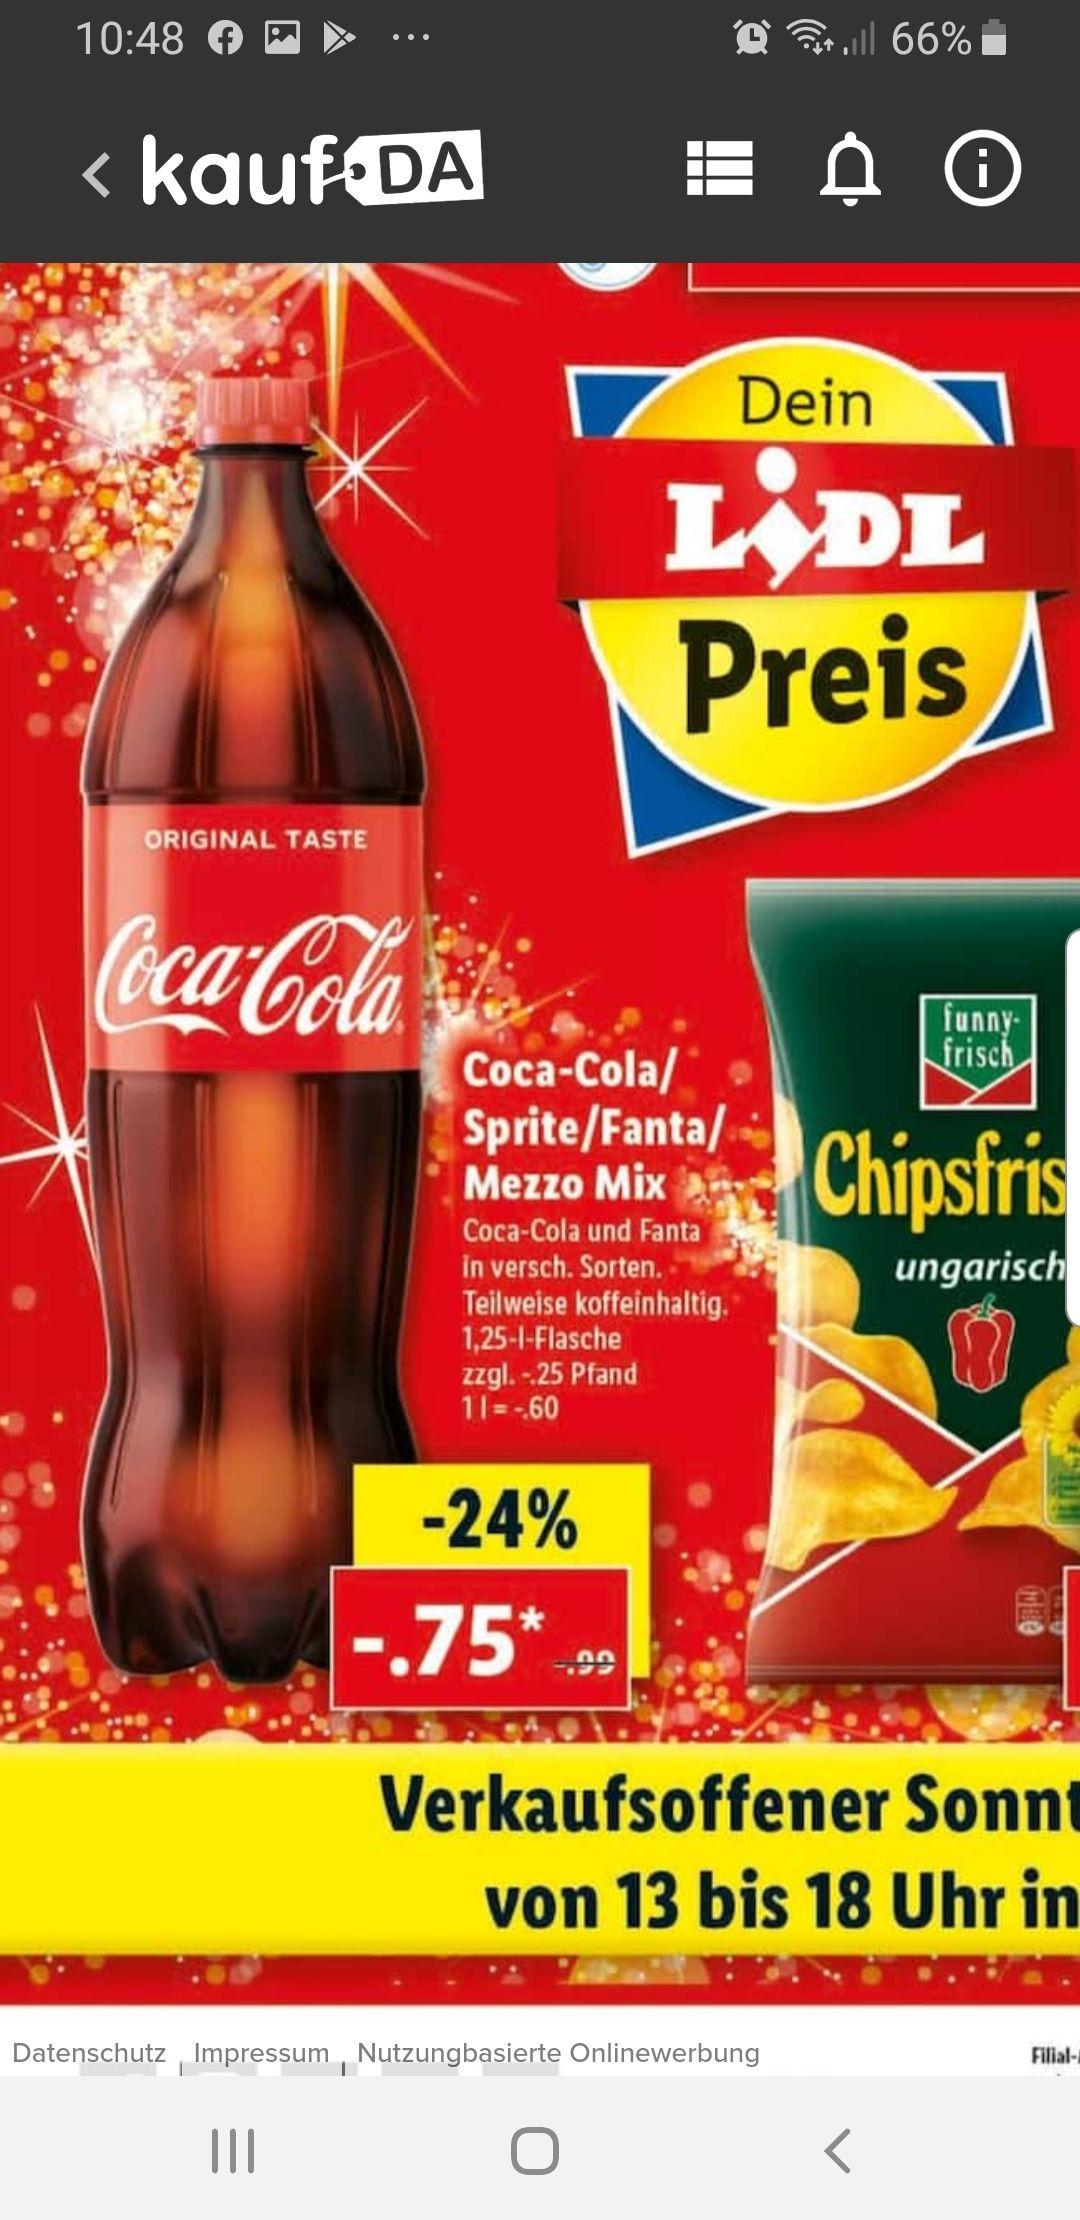 Coca cola, Sprite, Mezzo mix & Fanta [grensdeal]